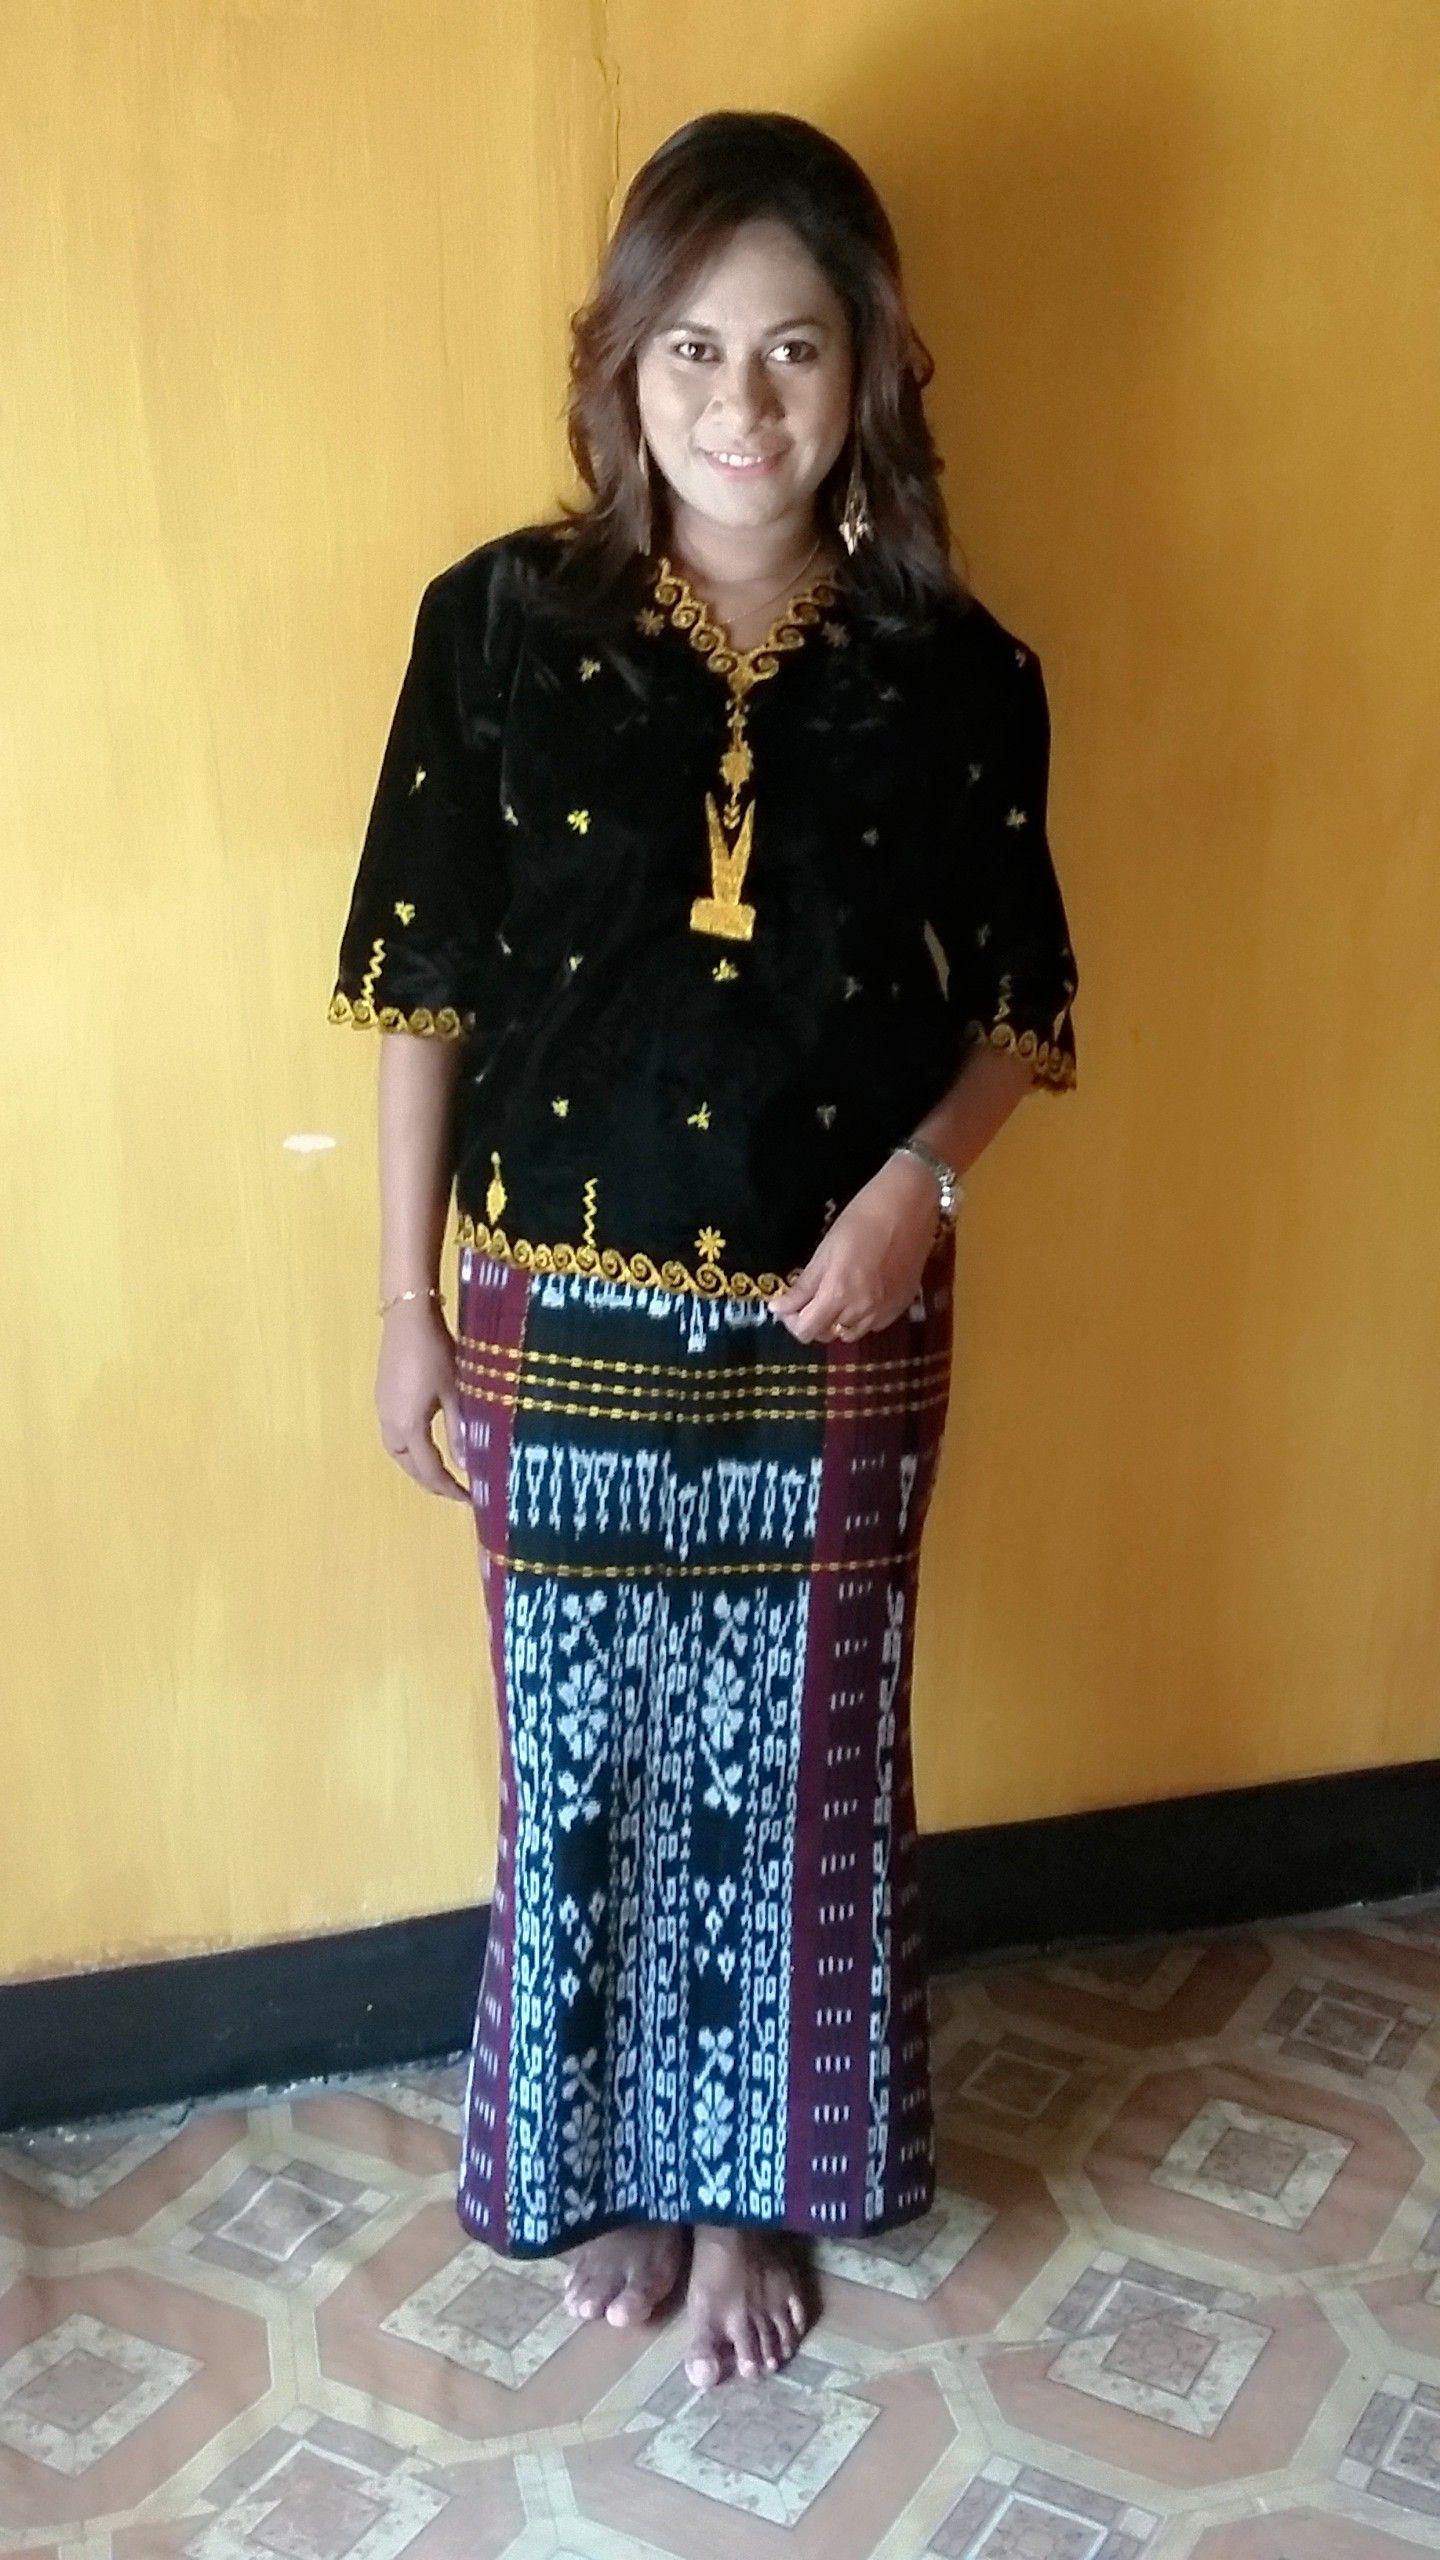 Gambar Pakaian Adat Nusa Tenggara Timur